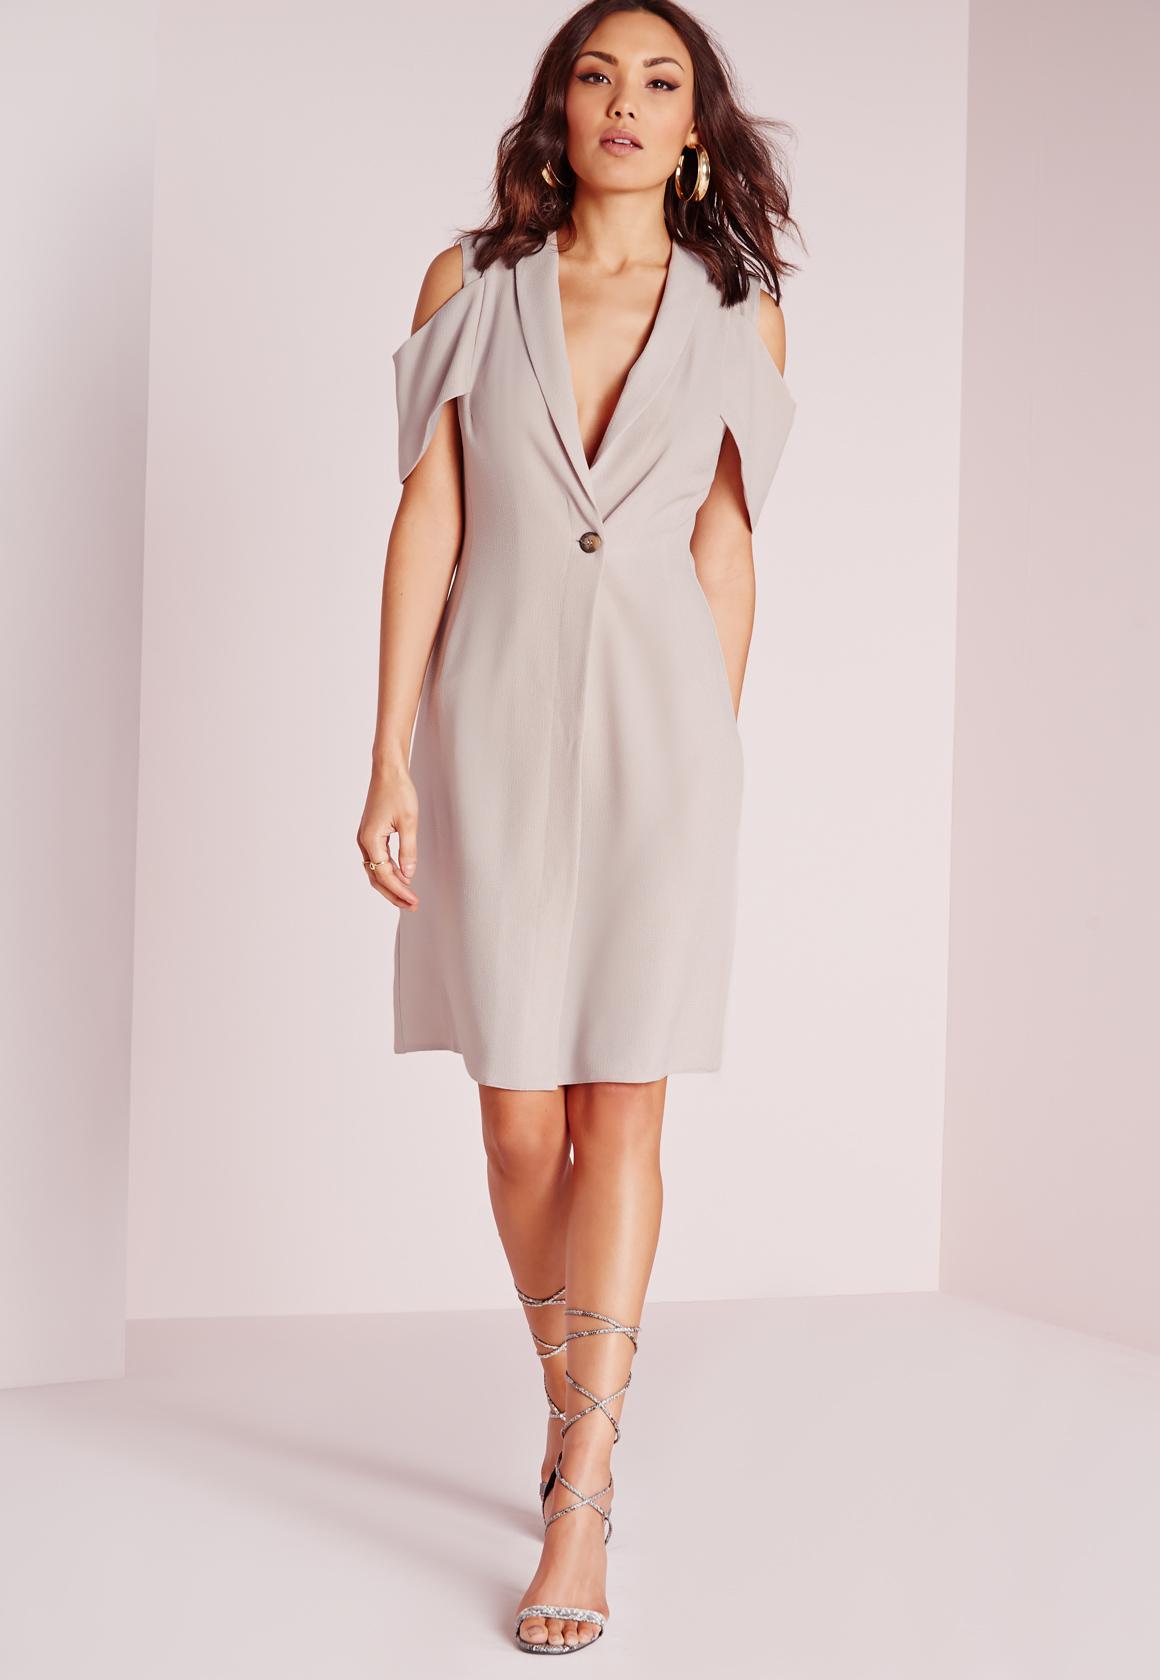 16a90f3f413f Lyst - Missguided Cold Shoulder Blazer Dress Grey in Gray